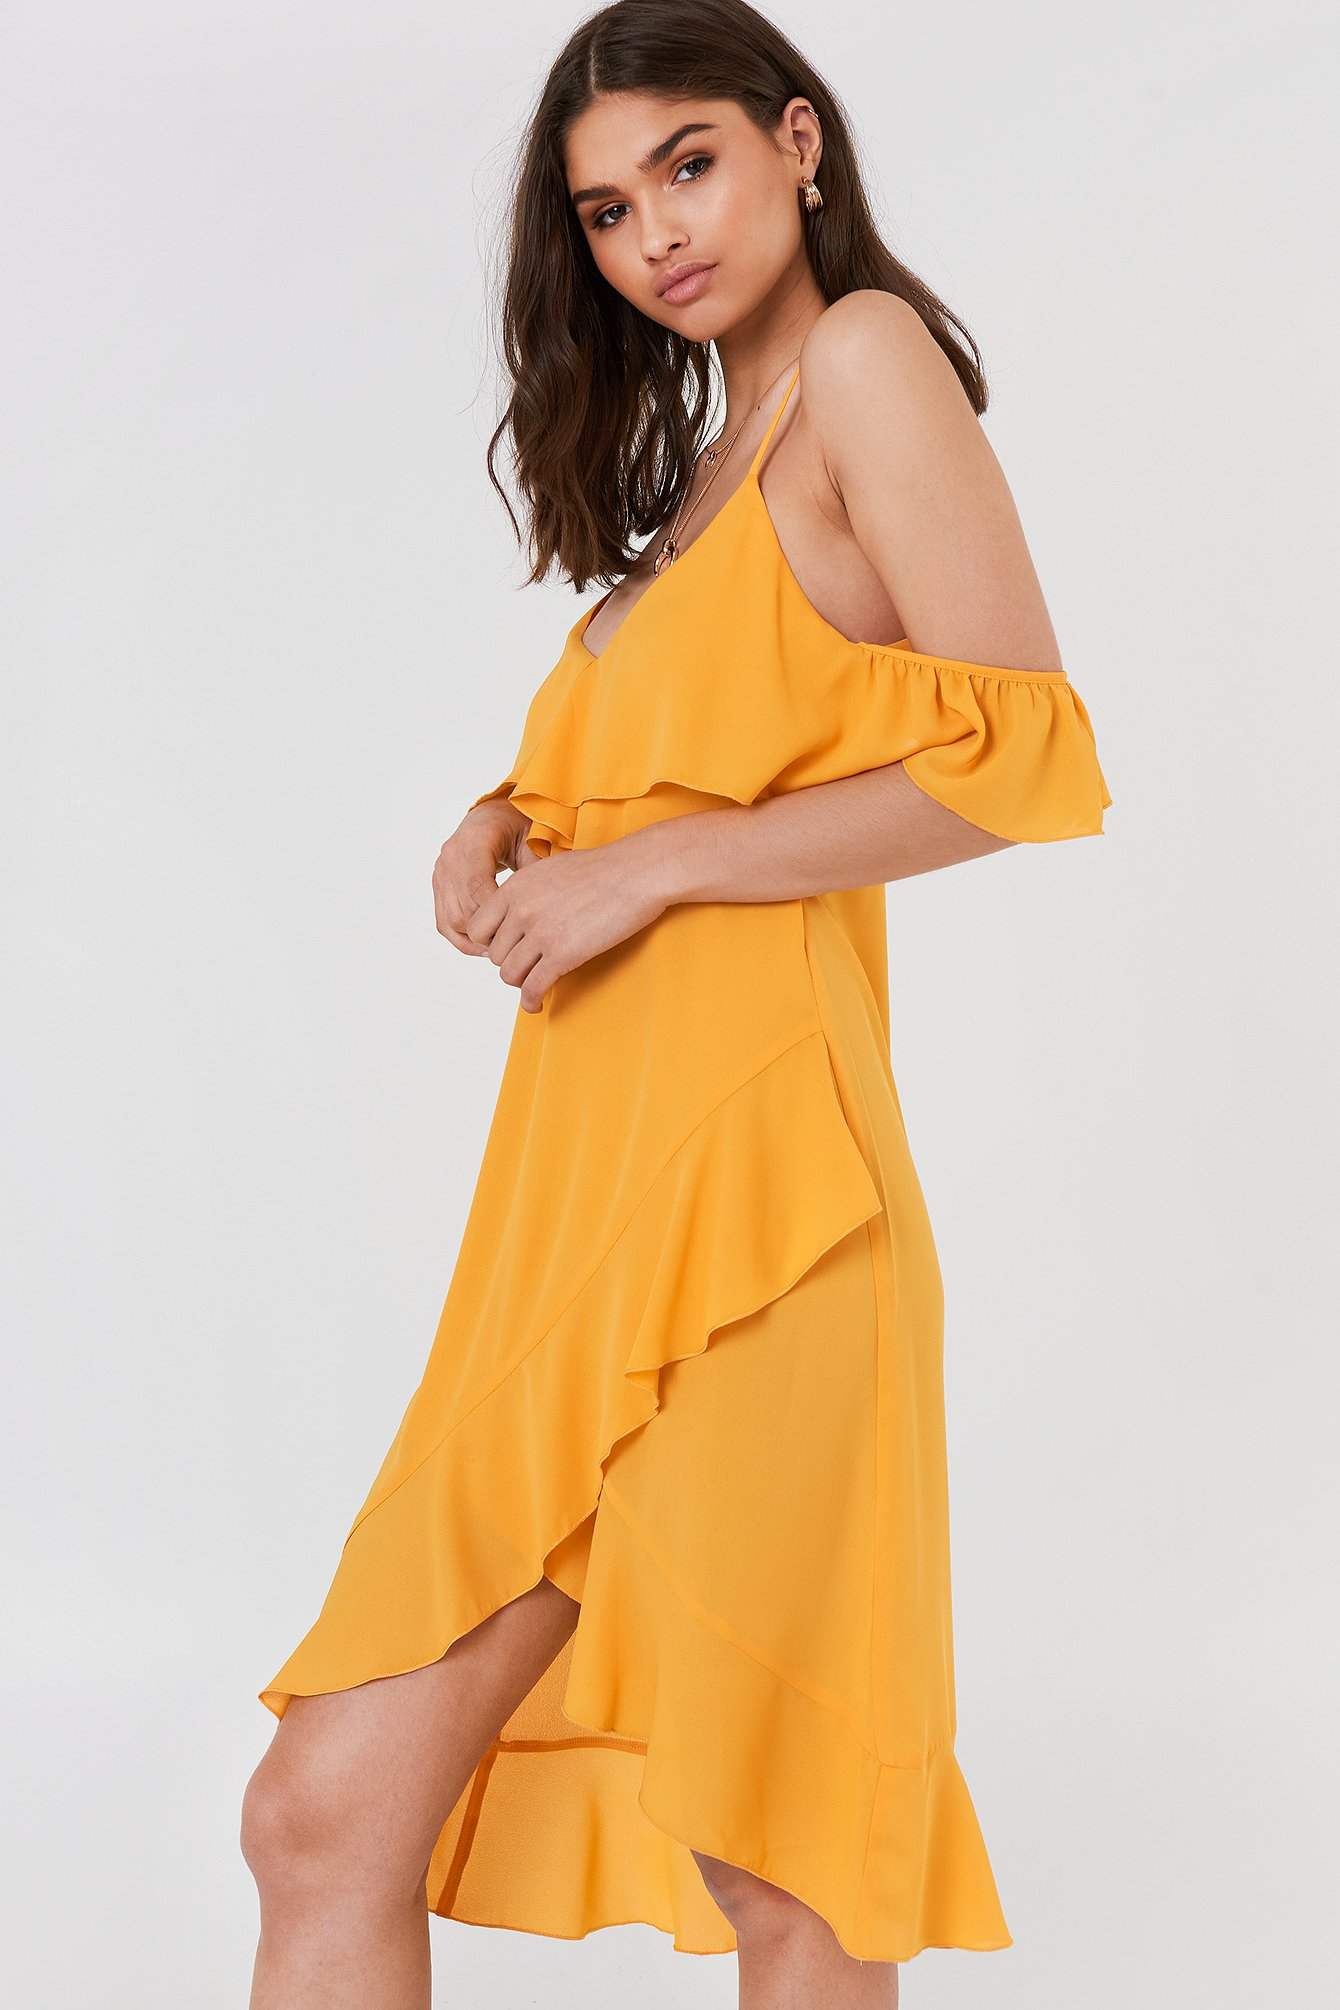 FAYT Heath Dress - Yellow